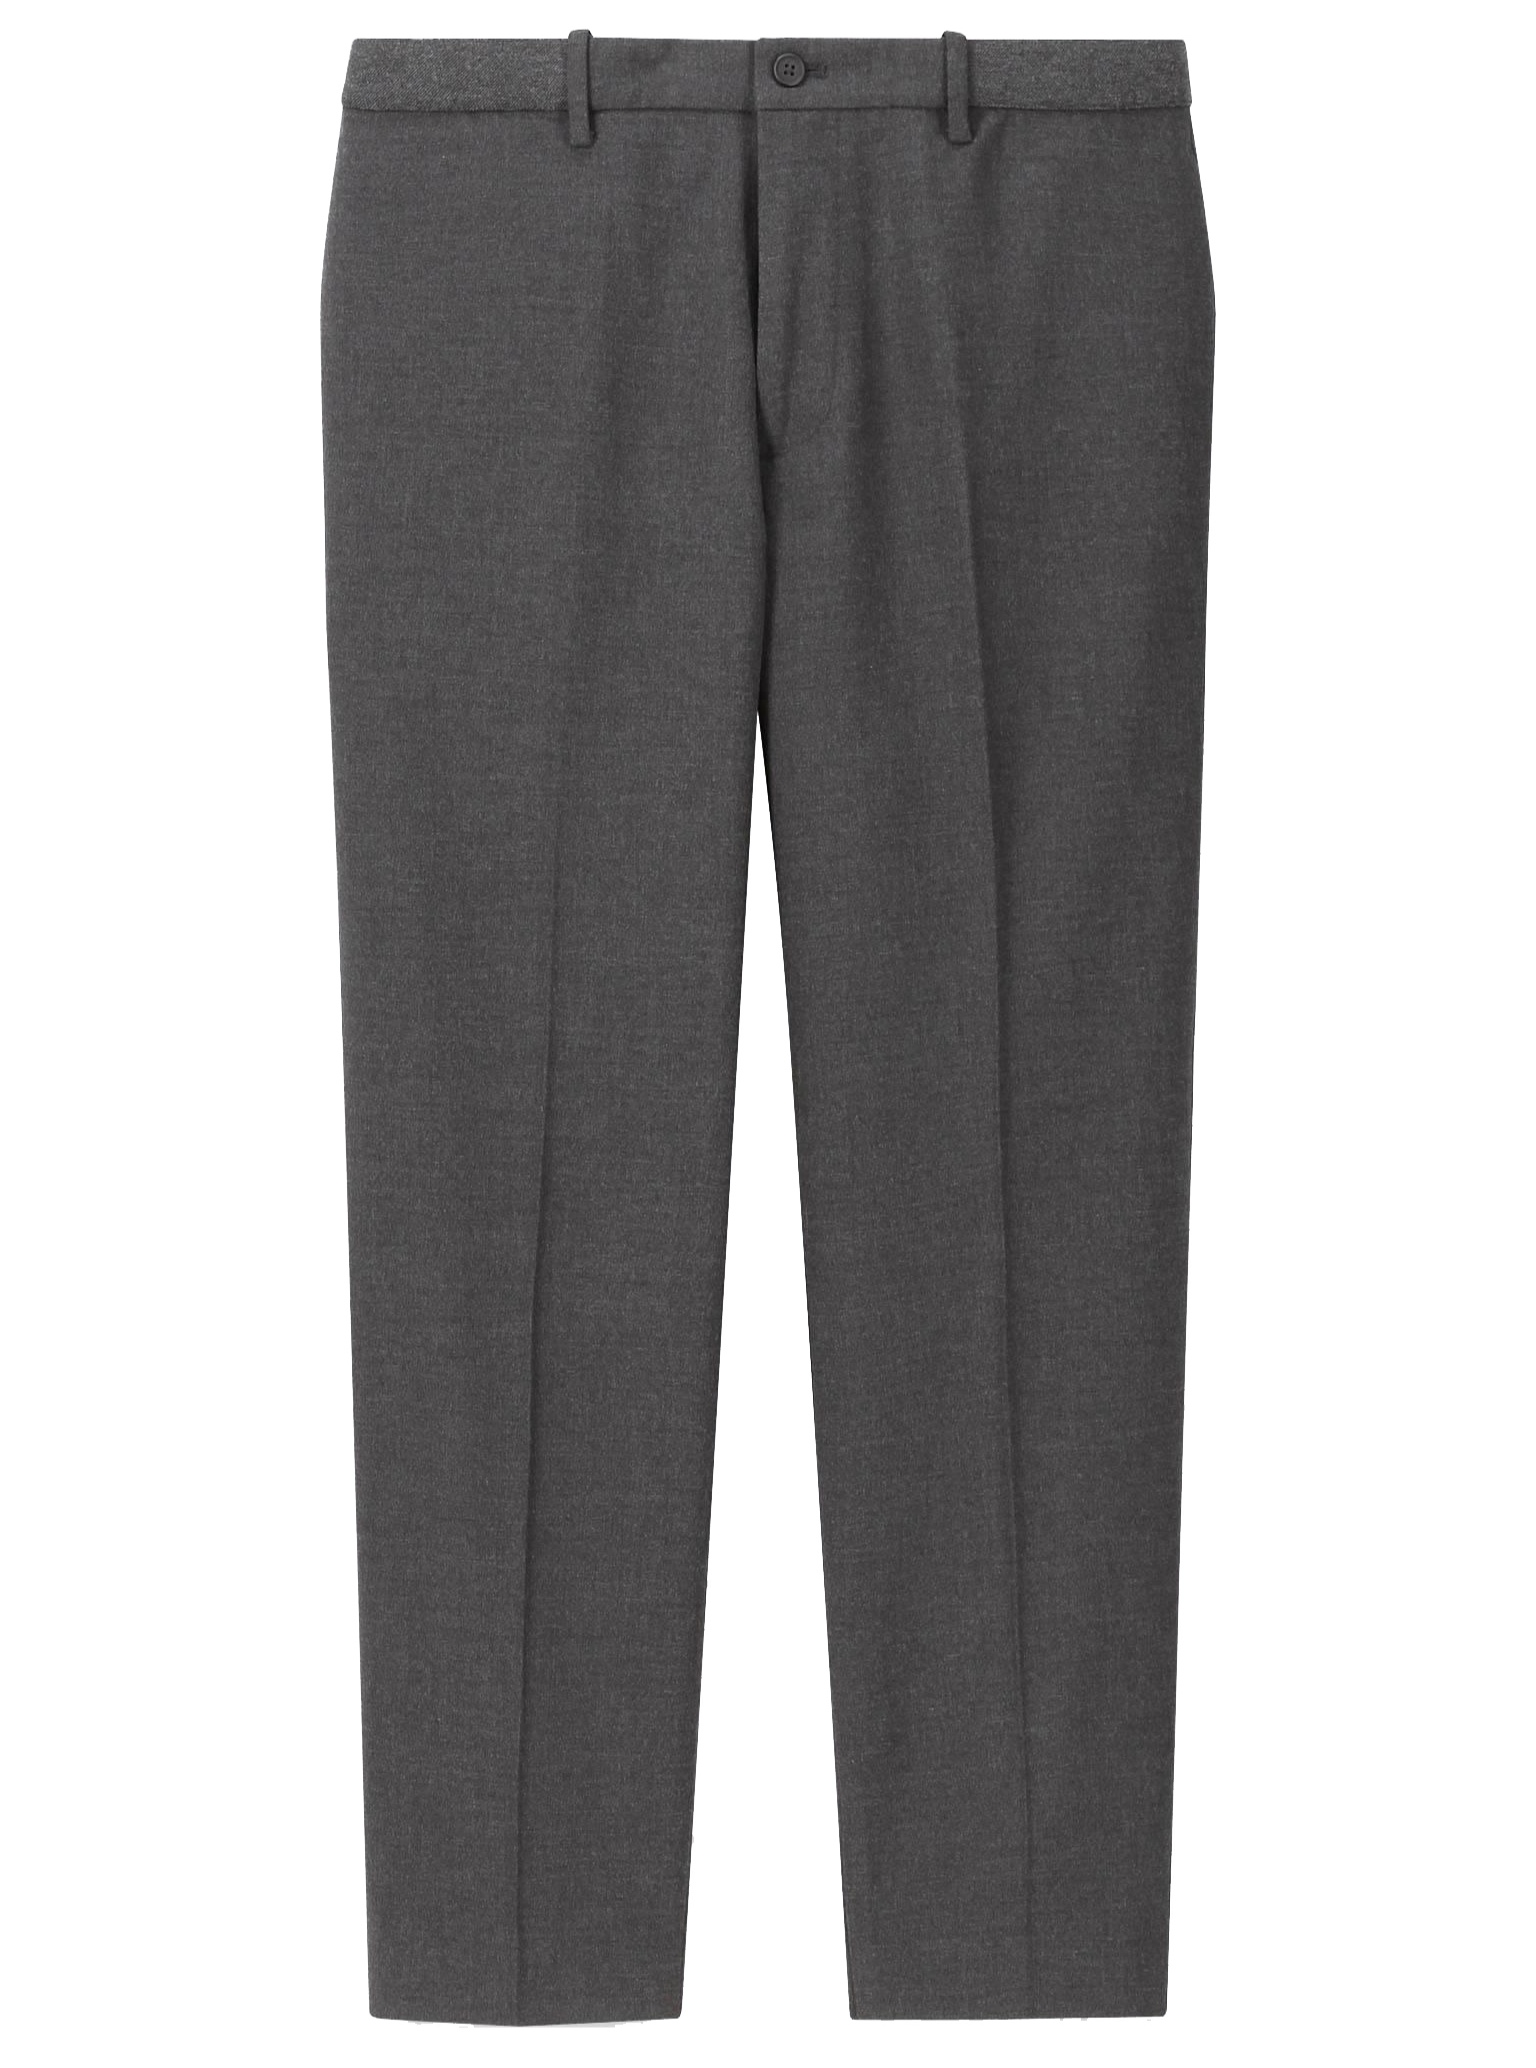 Uniqlo+-+Dark+Grey+Ankle+Trousersjpg.jpg